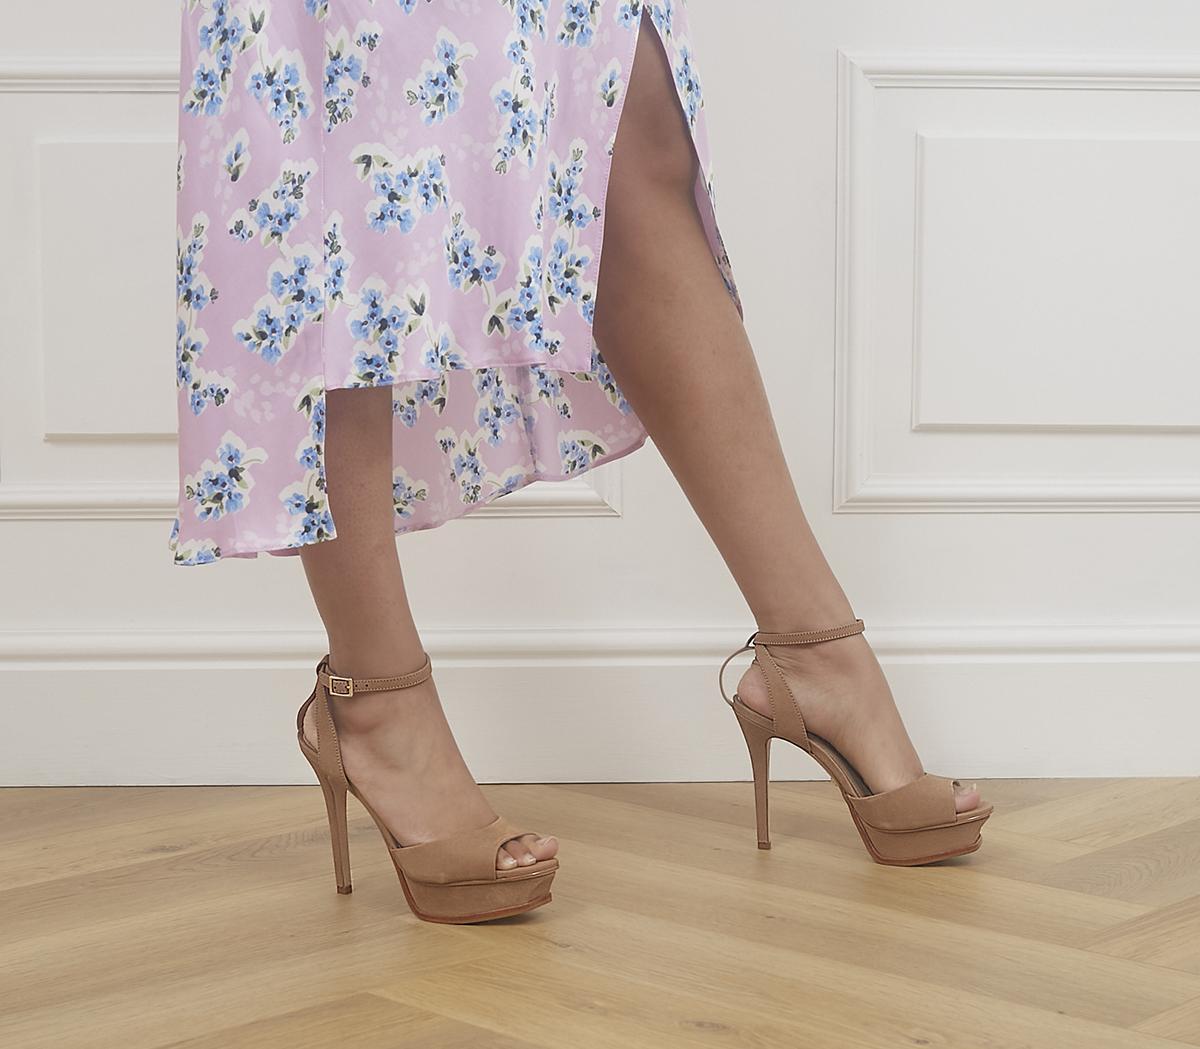 Hideaway Platform Stiletto Heels